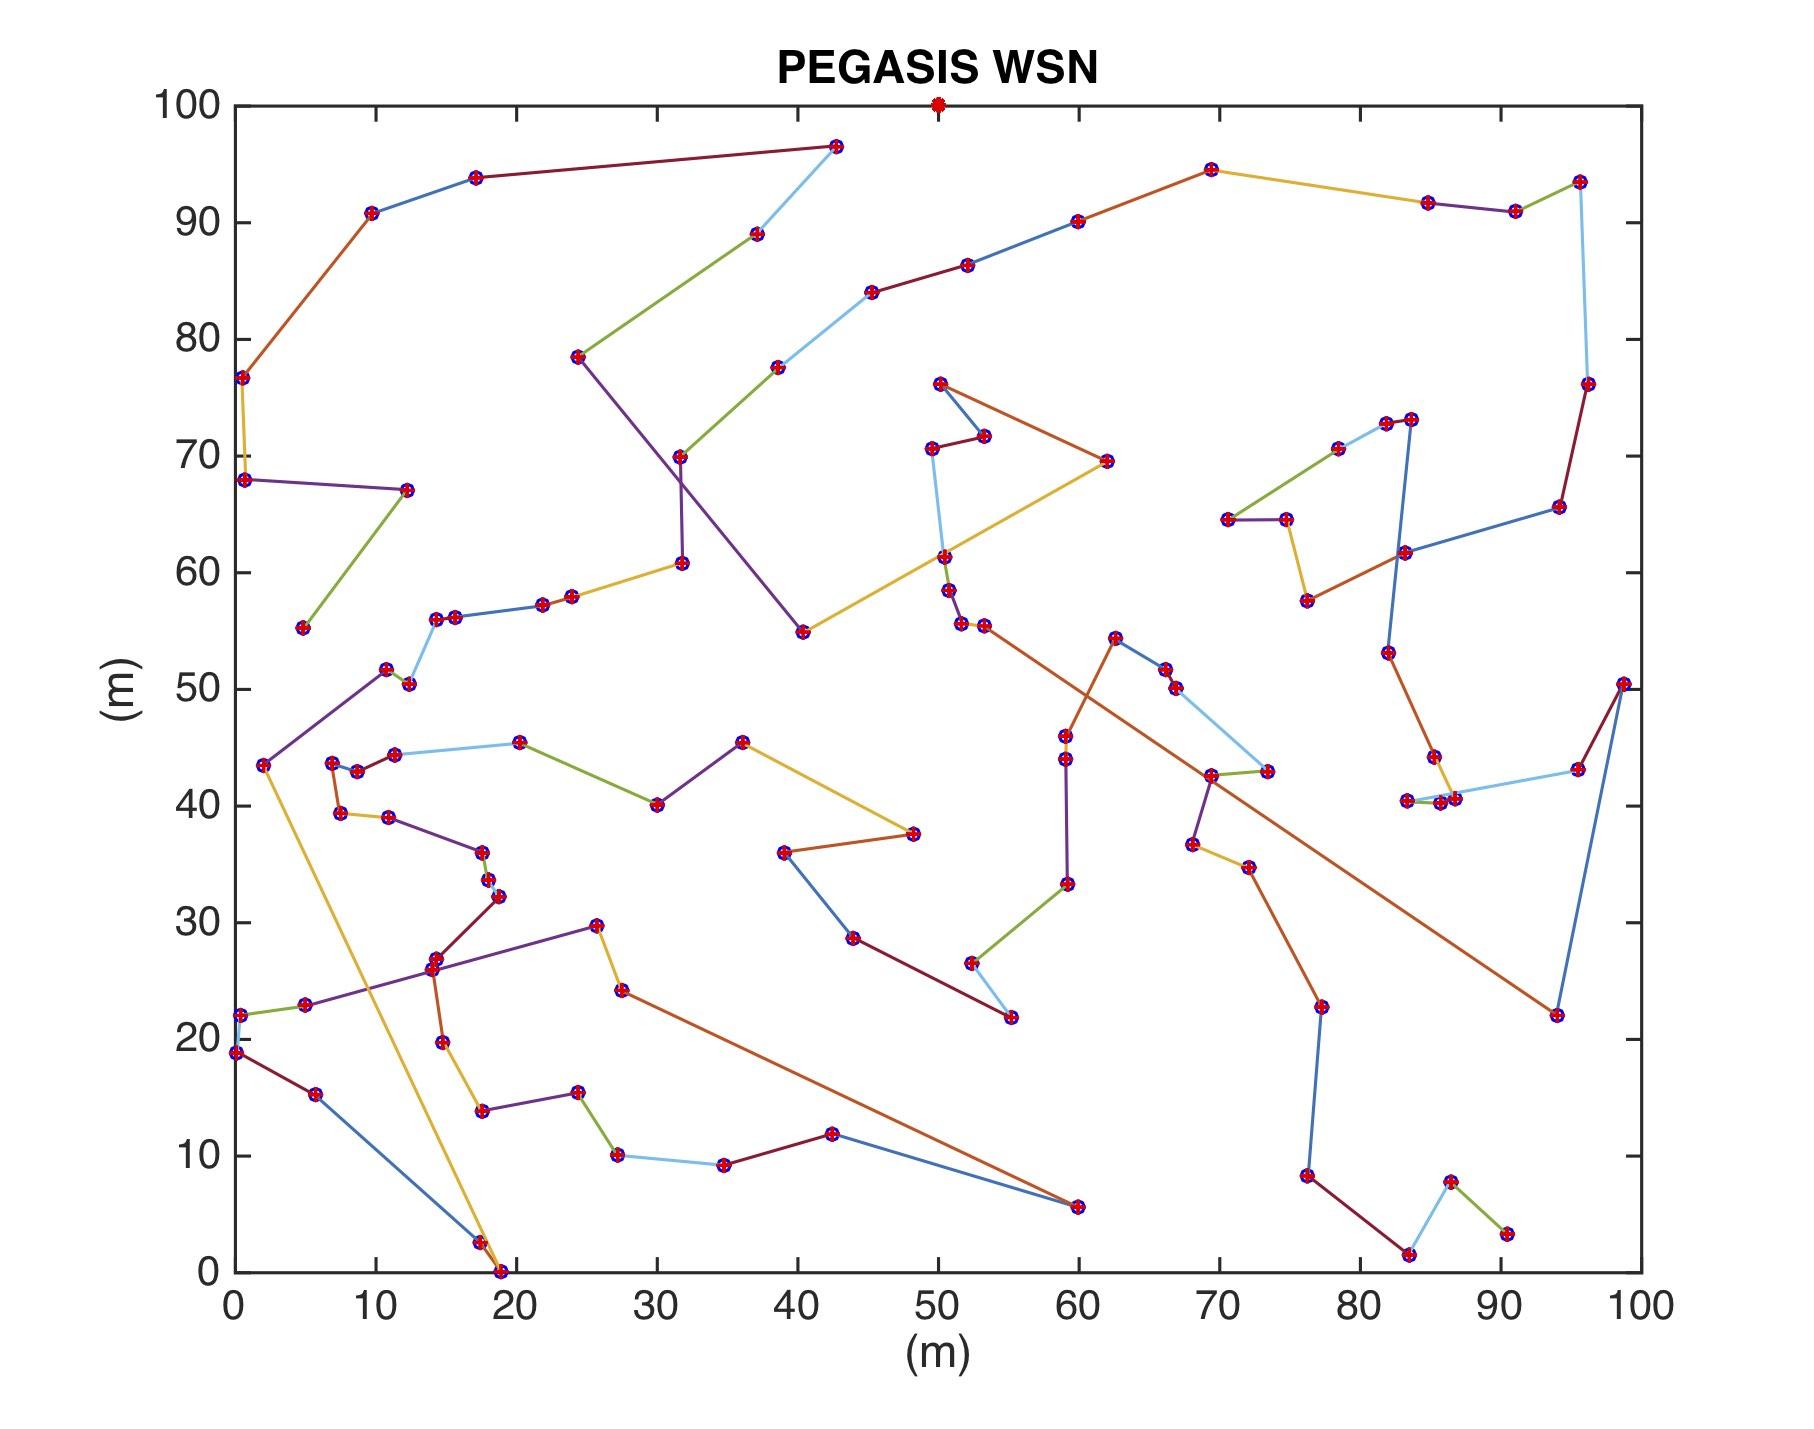 PEGASIS (Power-efficient gathering in sensor information